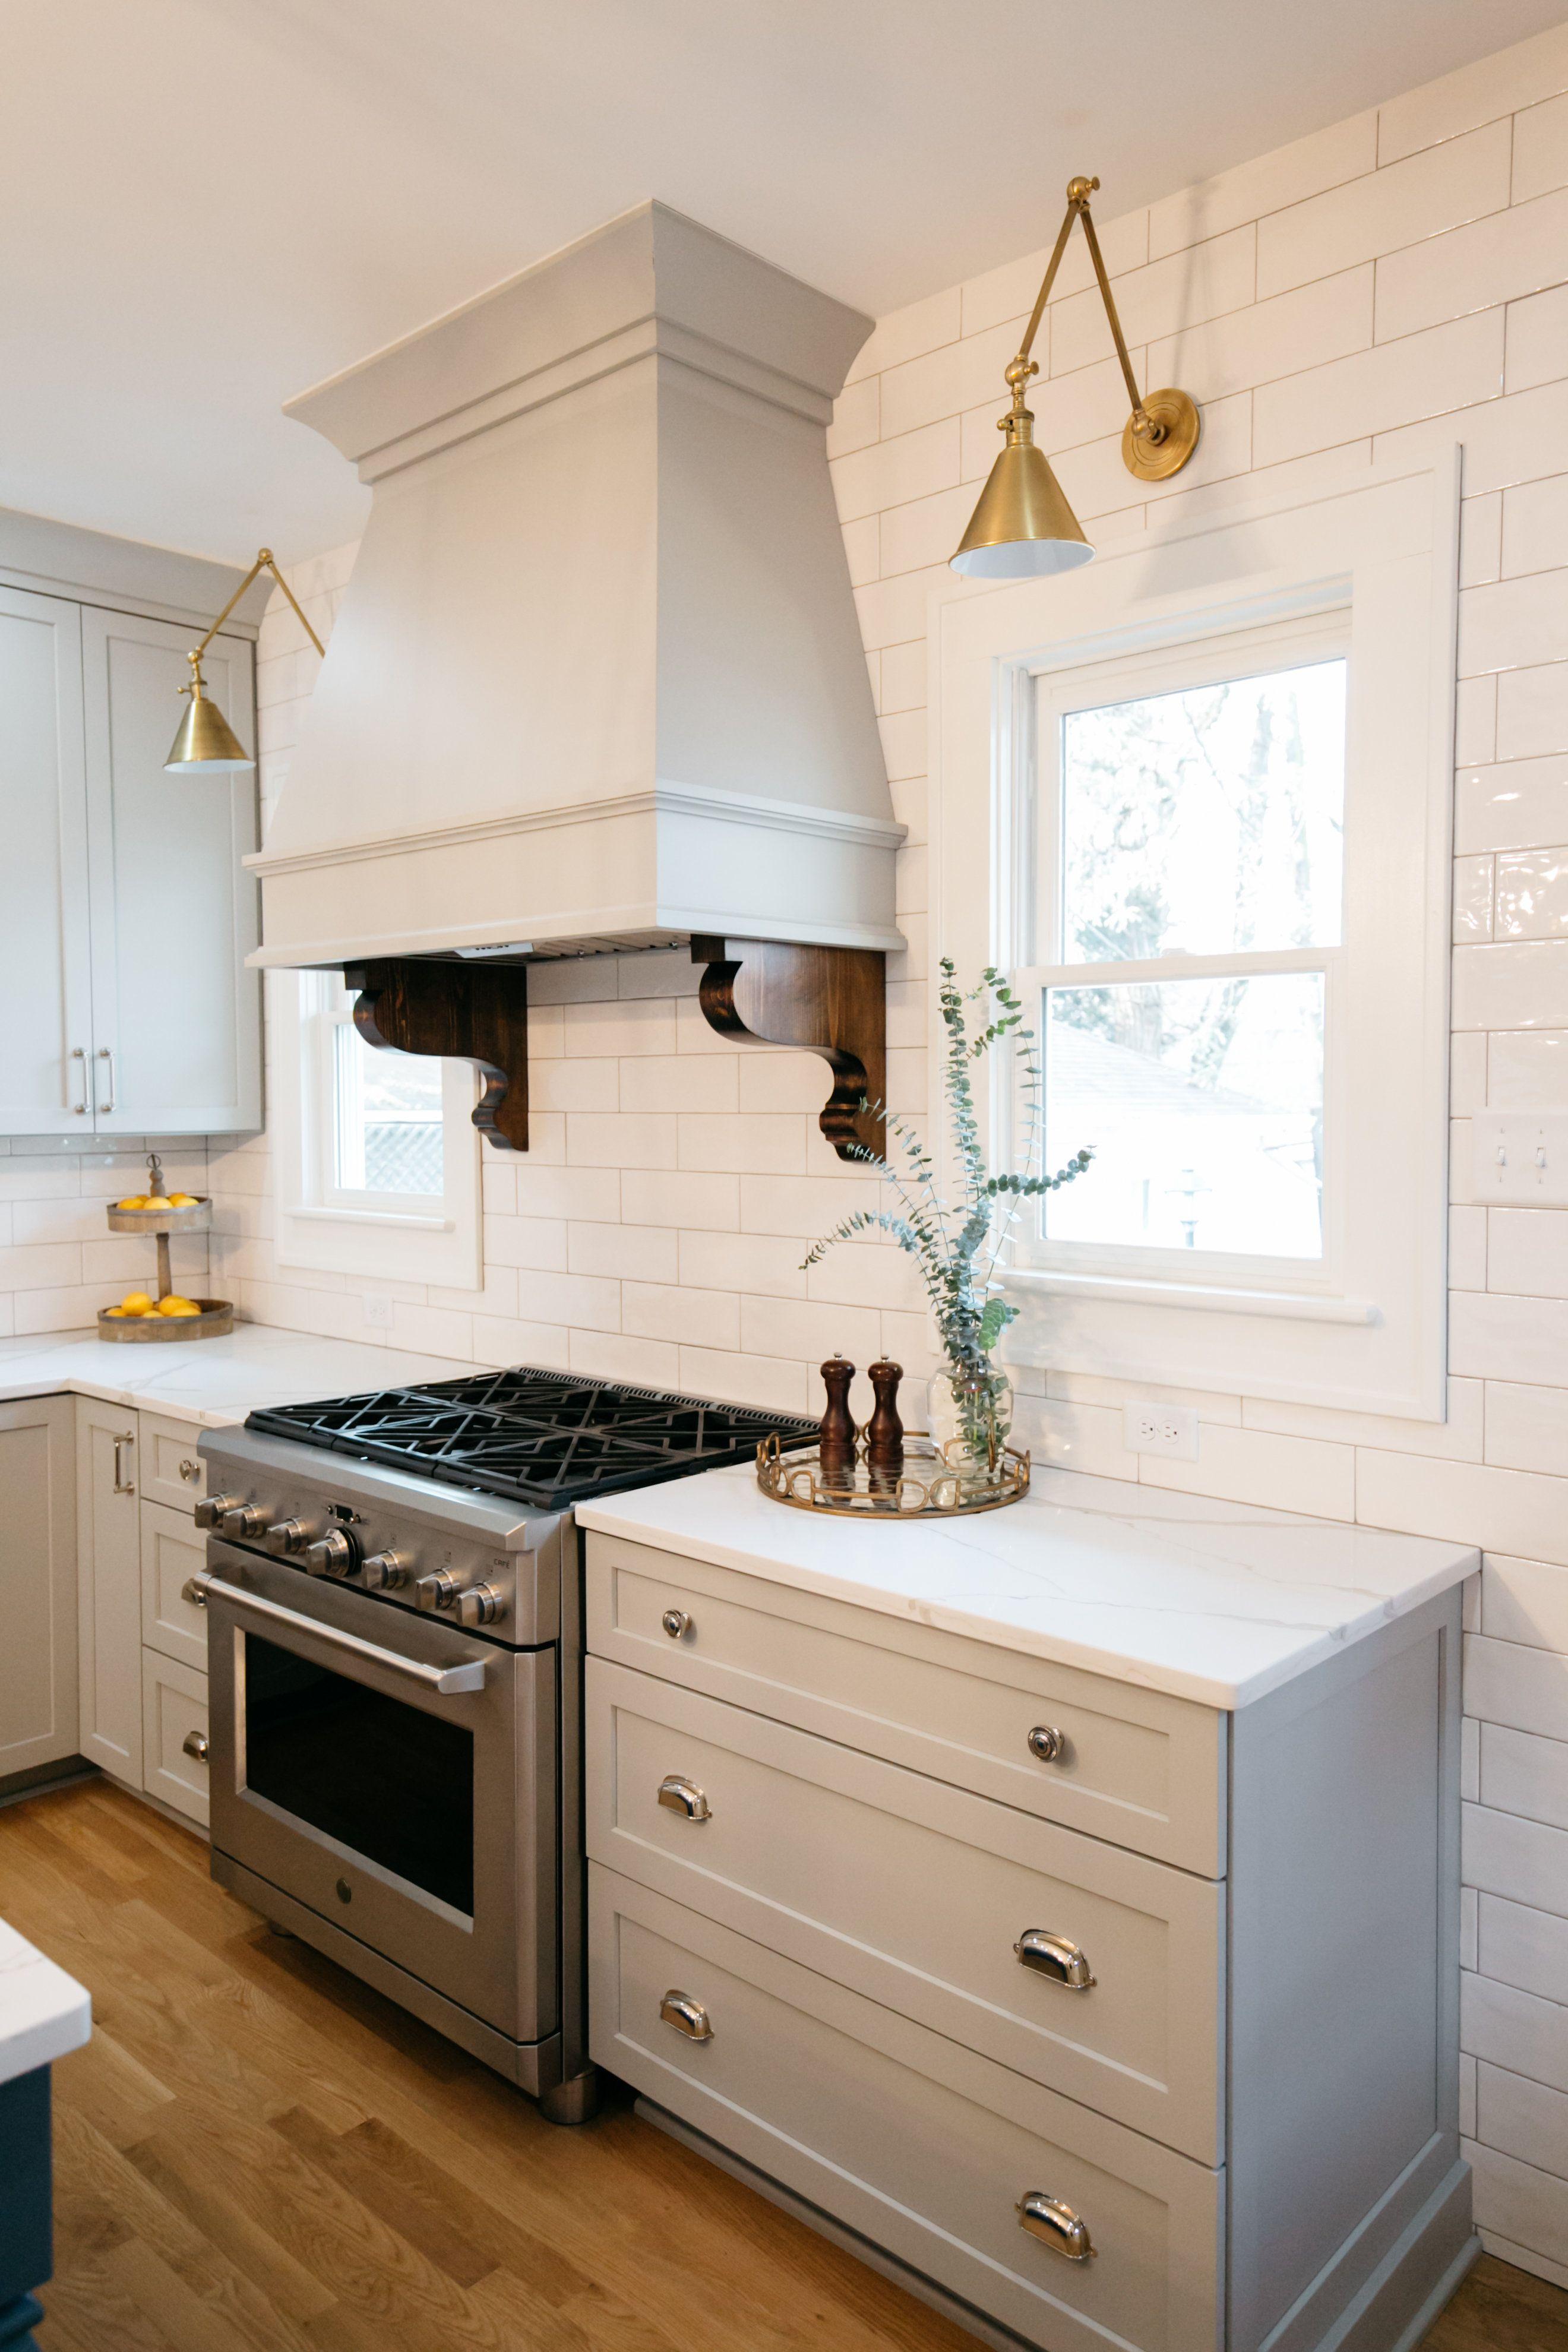 Pin By Tiffany Skilling Interiors On Kitchens Interior Design Interior Design